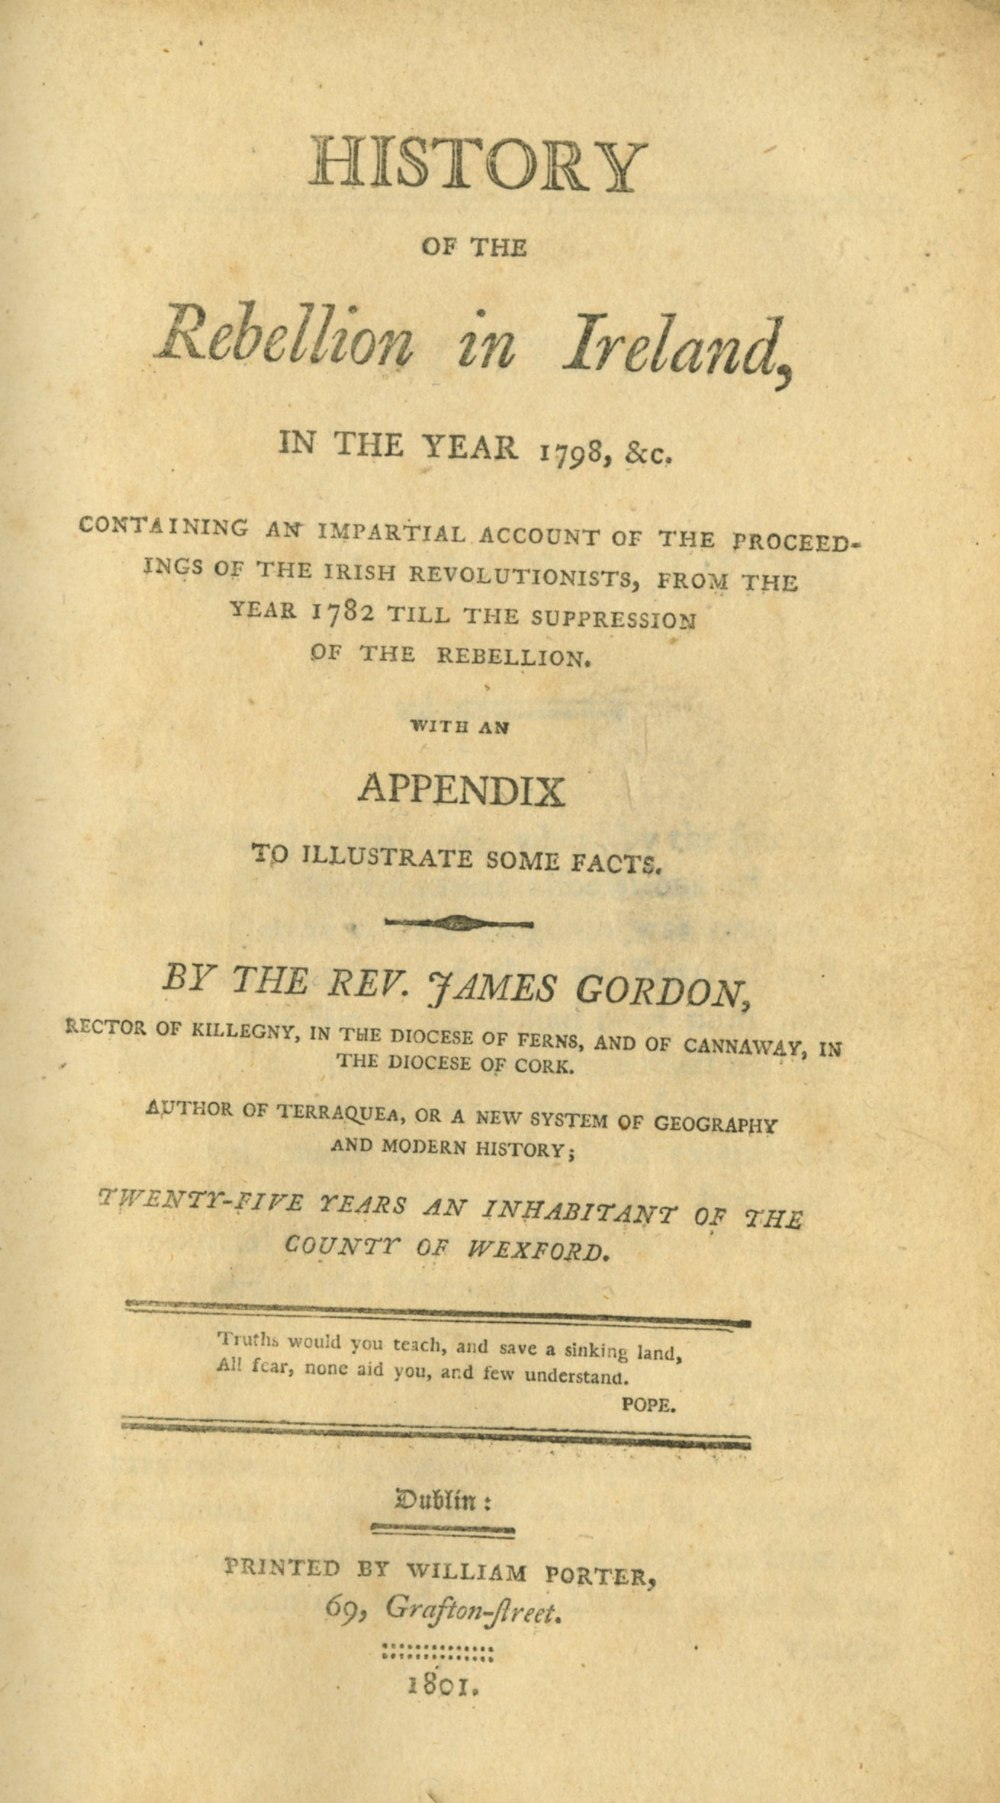 Lot 15 - 1798: Gordon (Rev. James) History of the Rebellion Ireland in the Year 1798, 8vo D. (Wm.